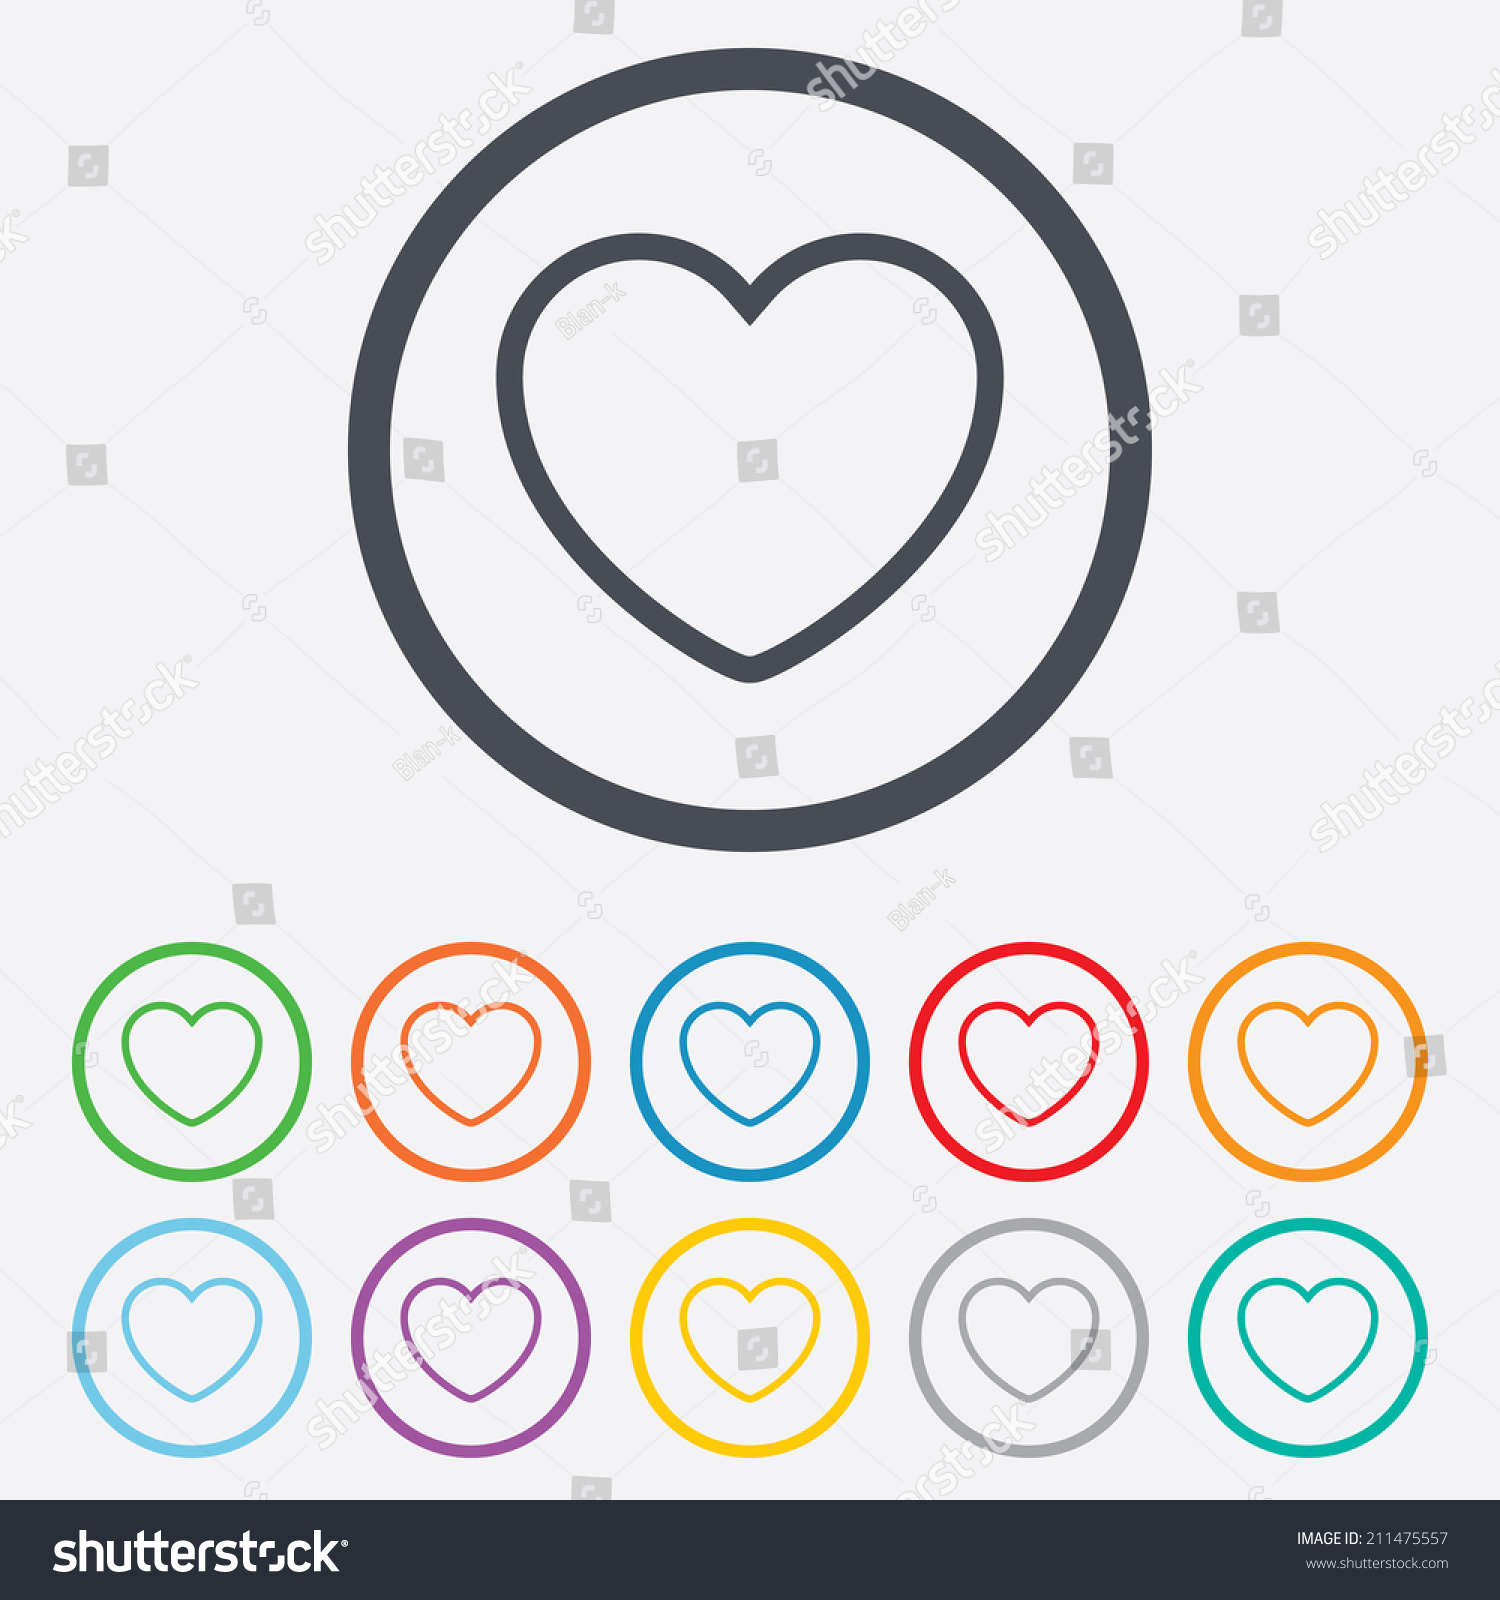 Heart sign icon love symbol round stock vector 211475557 heart sign icon love symbol round stock vector 211475557 shutterstock buycottarizona